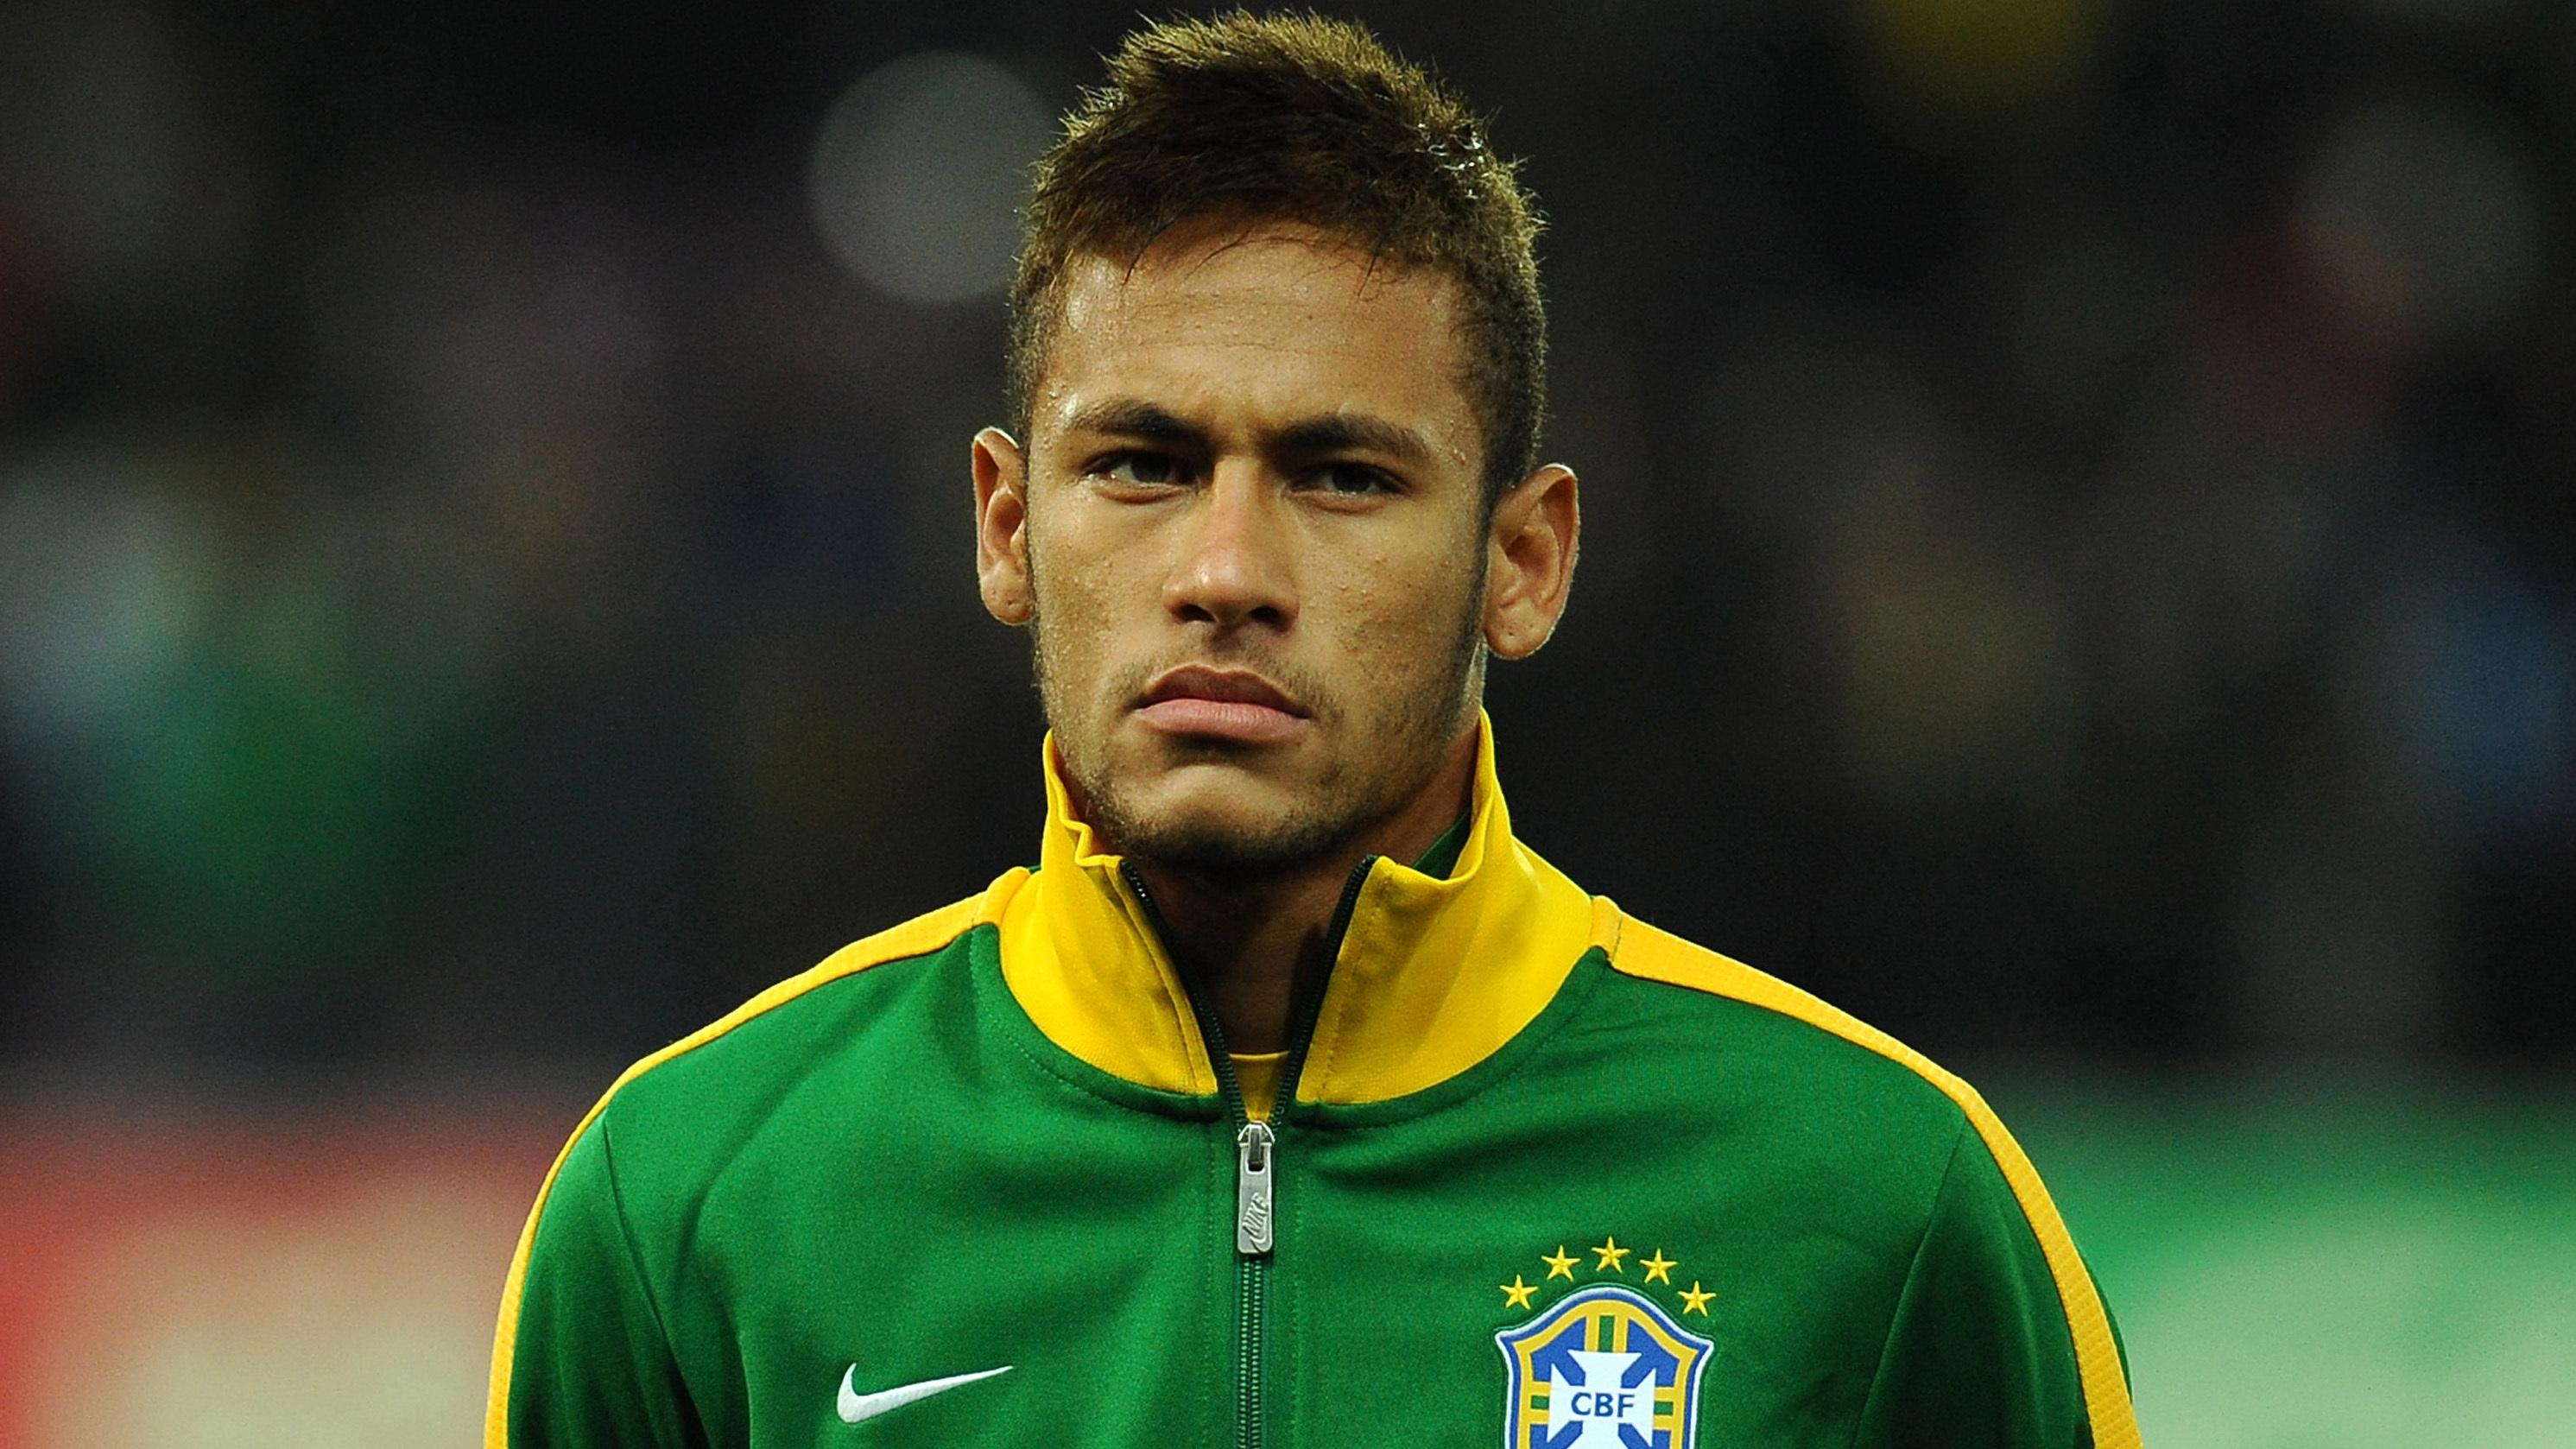 Neymar Wallaper Jr Hd